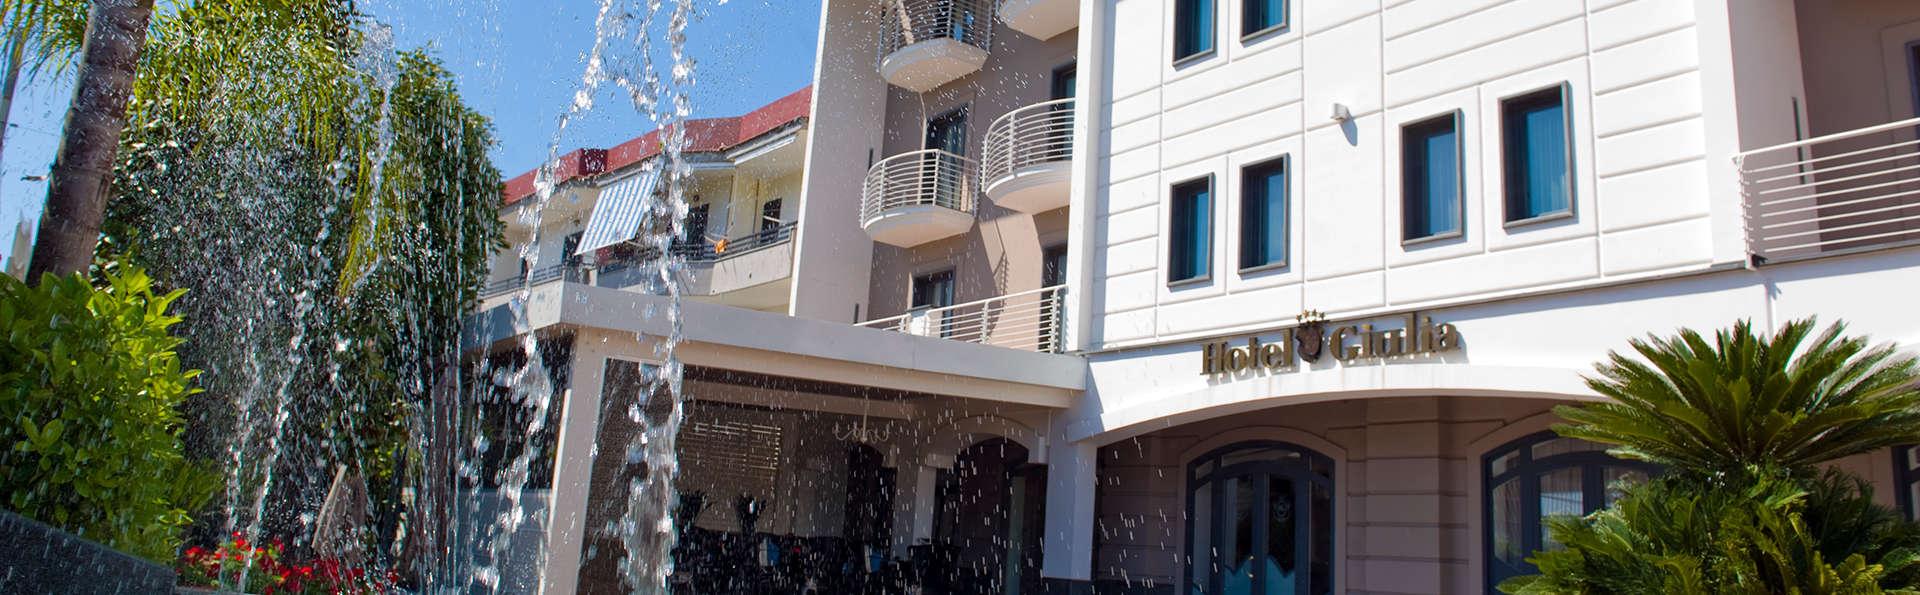 Hotel Giulia - edit_pool2.jpg